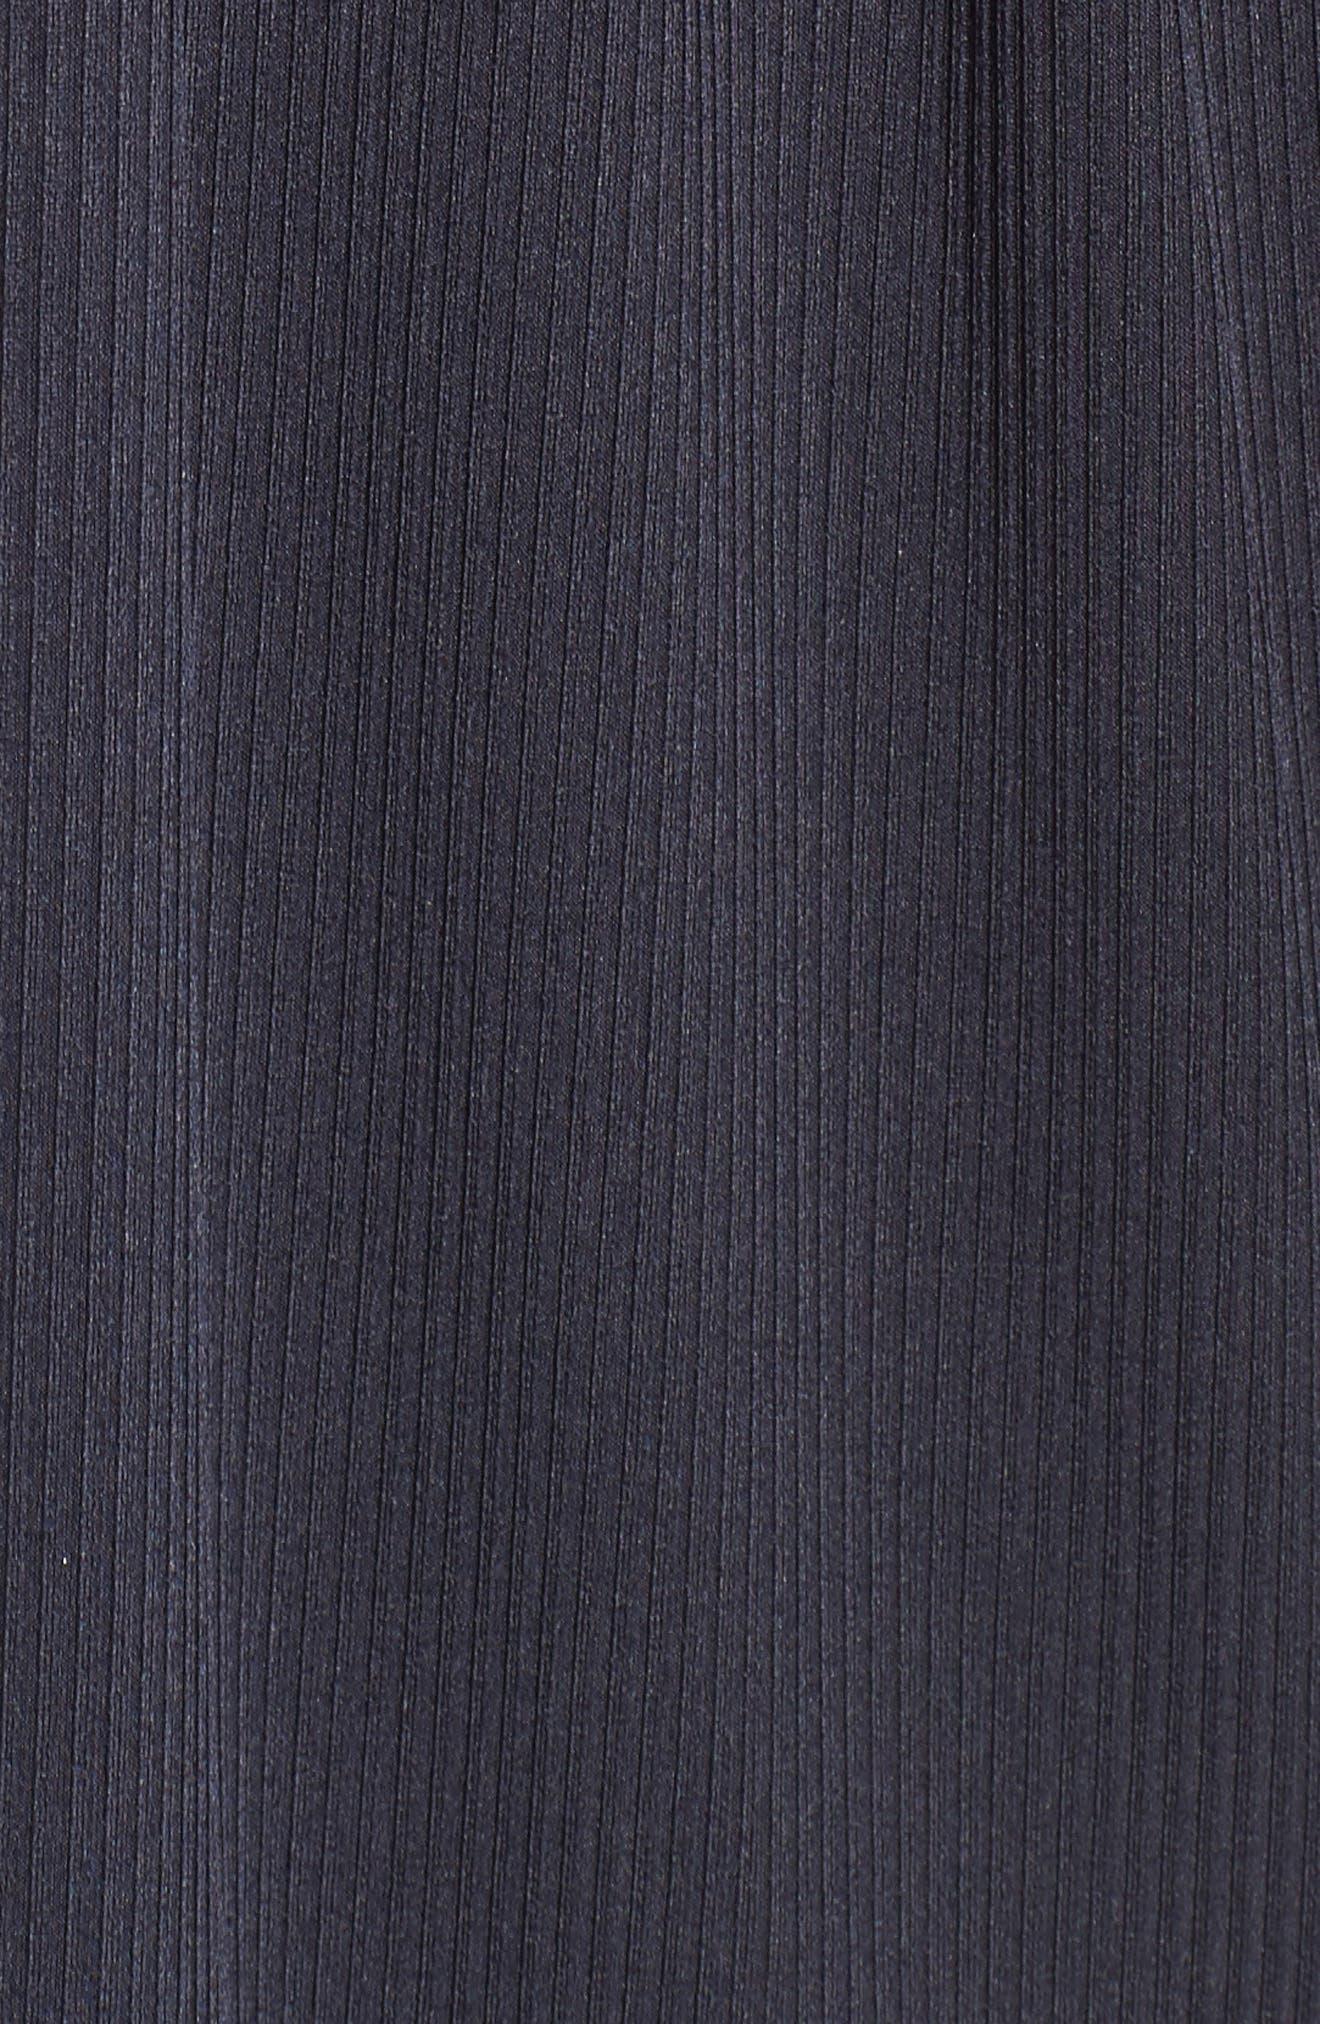 Ruffle Ribbed Knit Dress,                             Alternate thumbnail 5, color,                             410